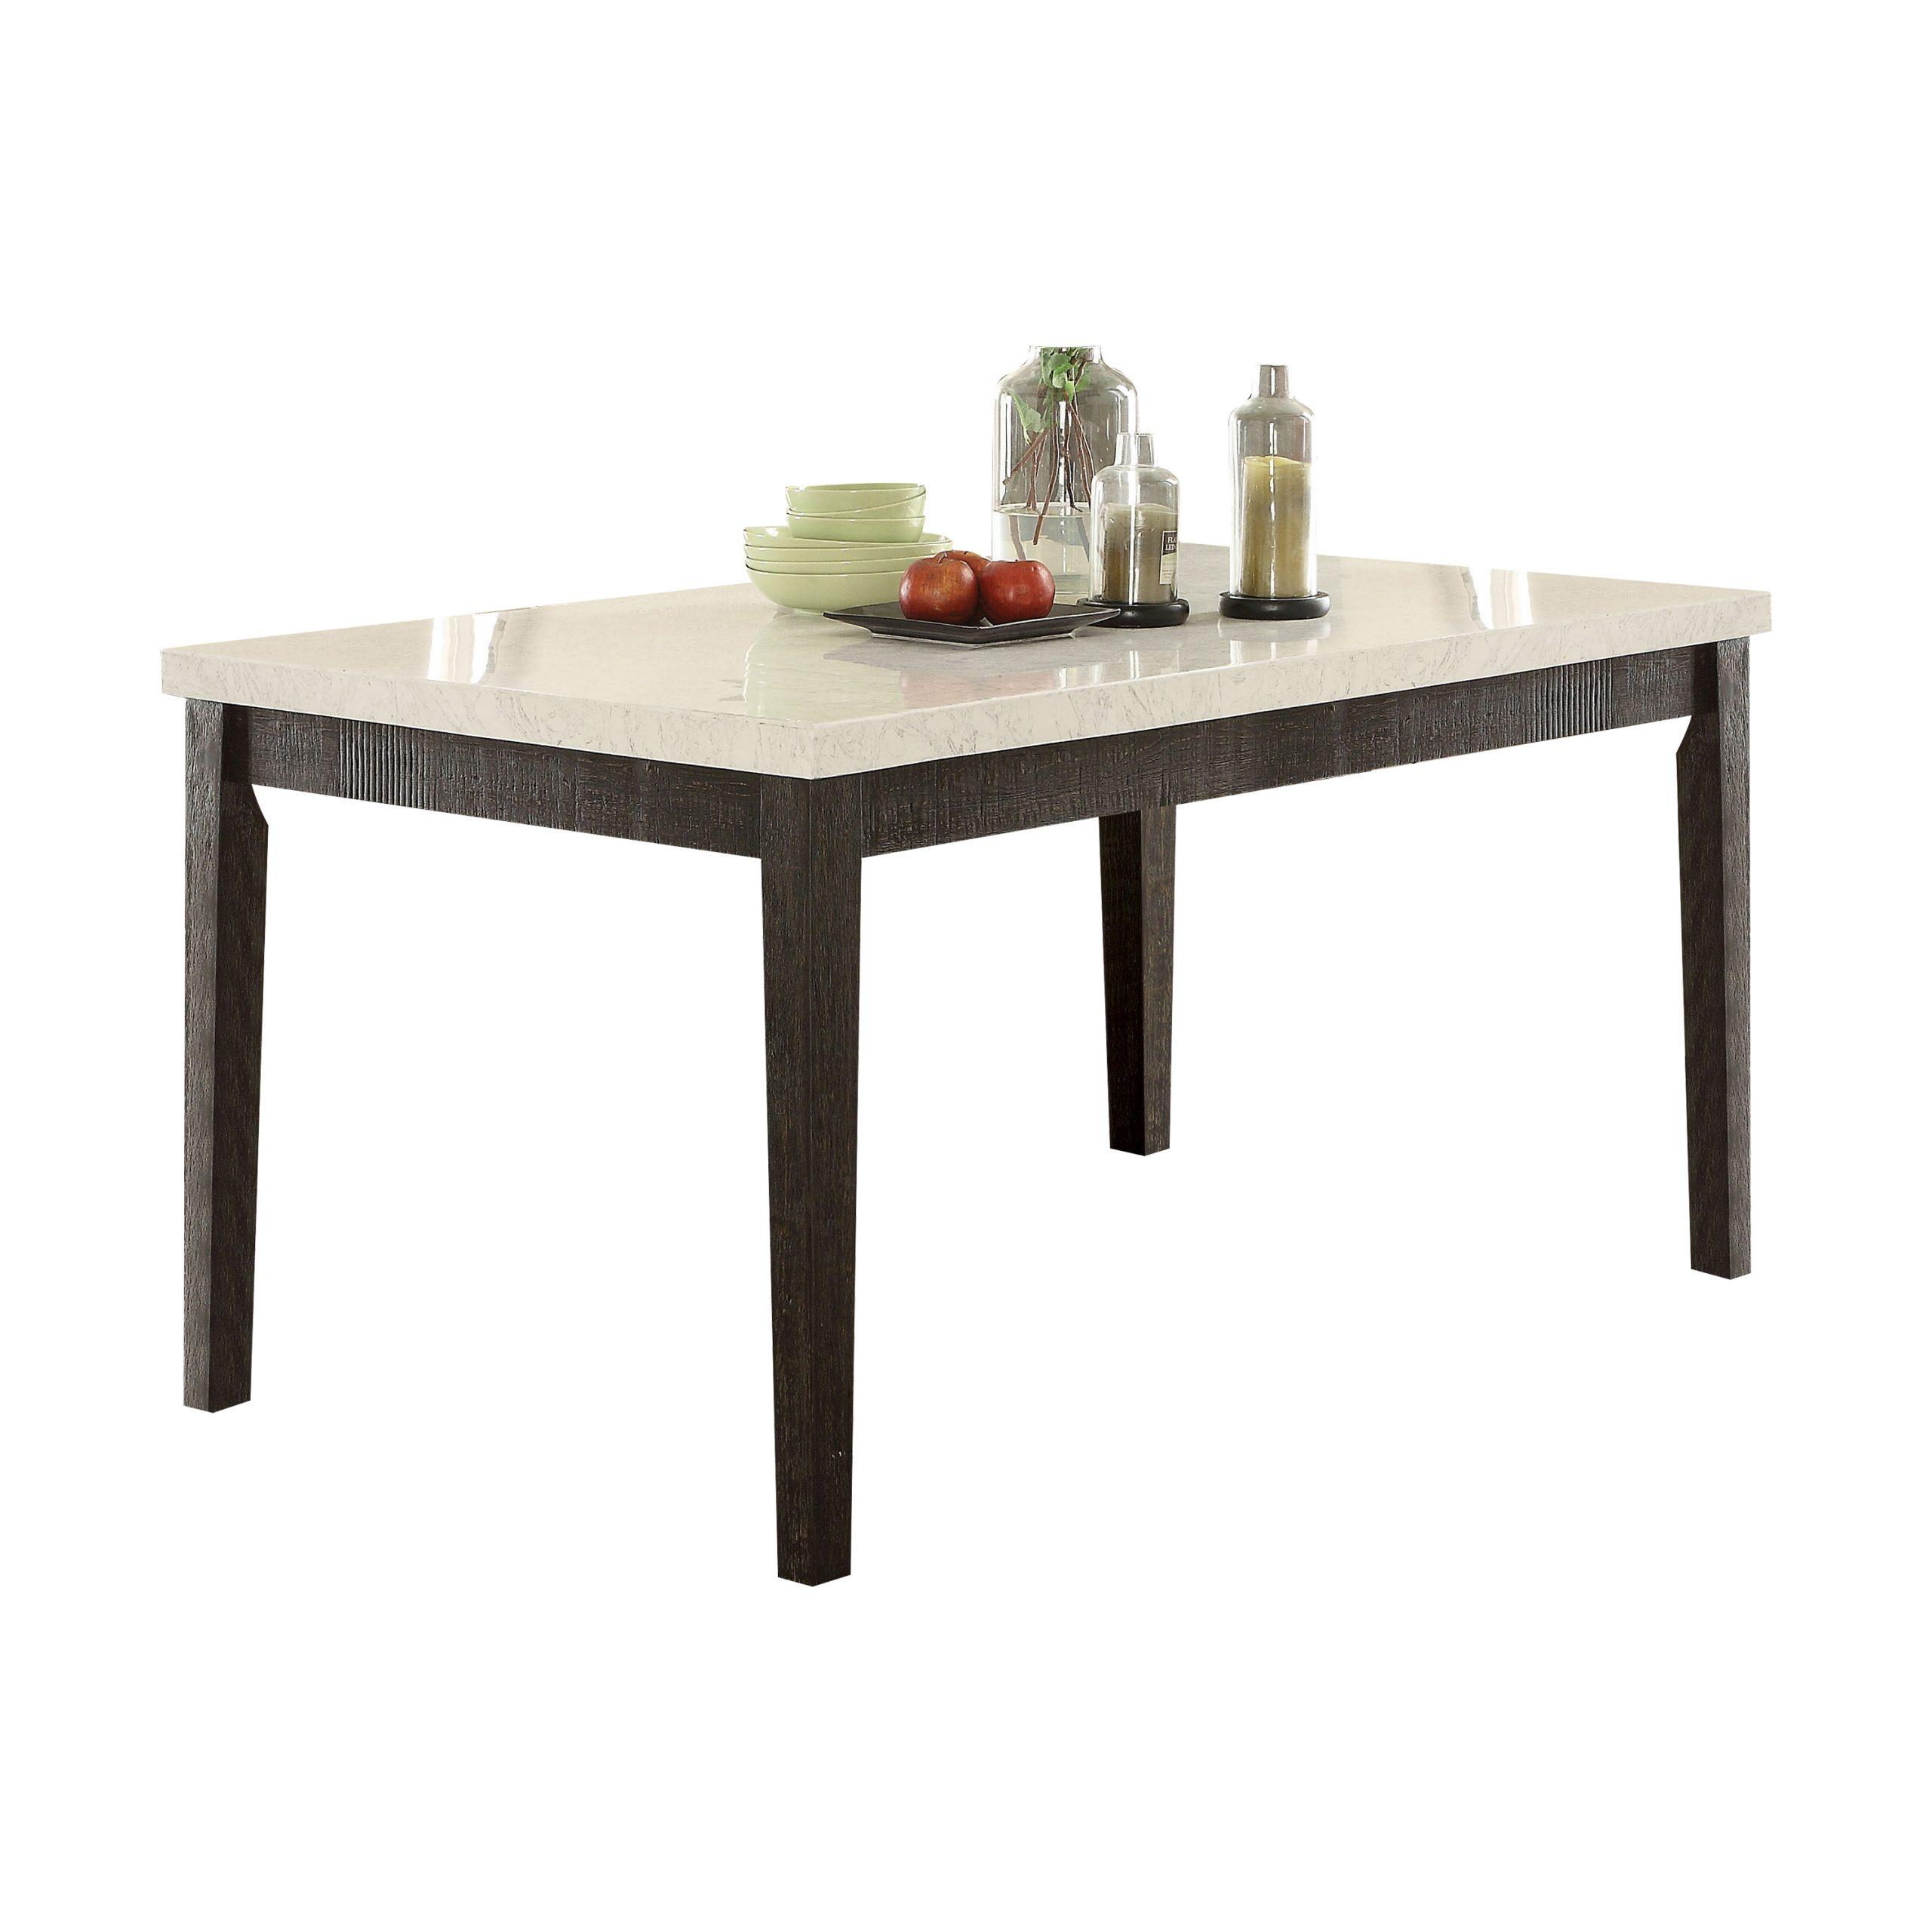 Acme Nolan Rectangular Dining Table, White Marble & Weathered Black (View 18 of 25)